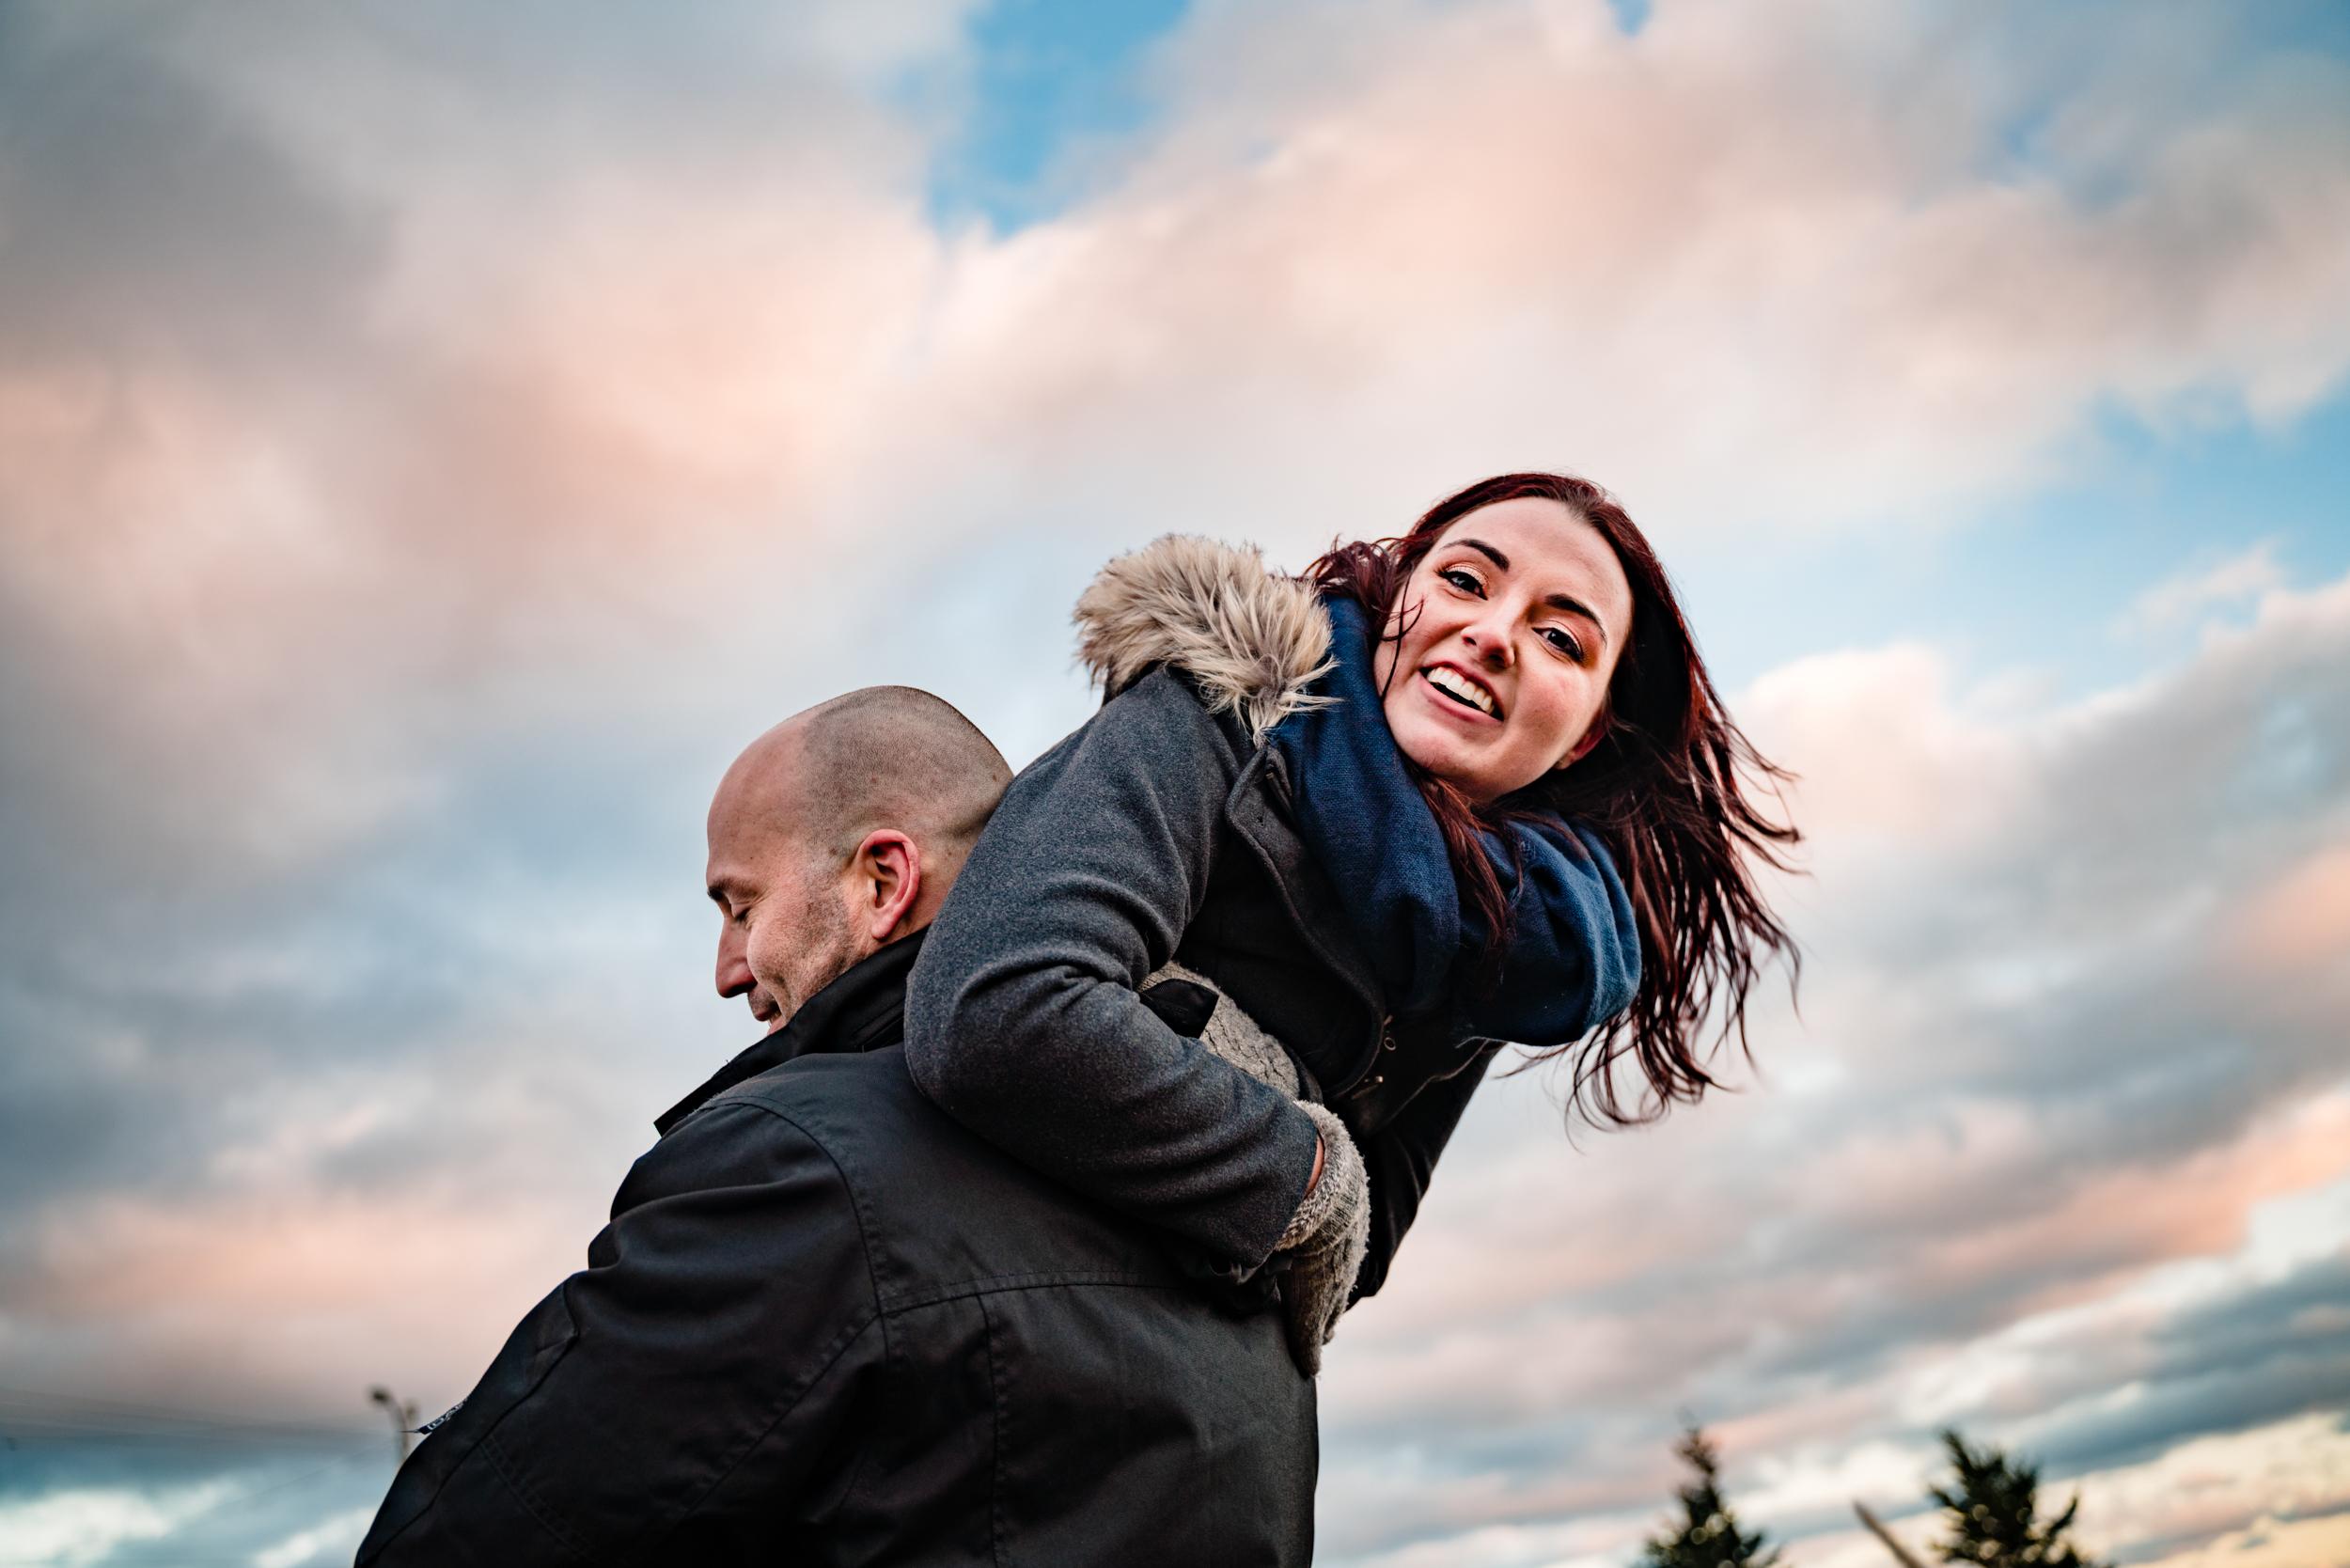 Sarah&Shayne-Halifax-engagement-weddingphotography-weddingphotographers-novascotia (41 of 41).jpg